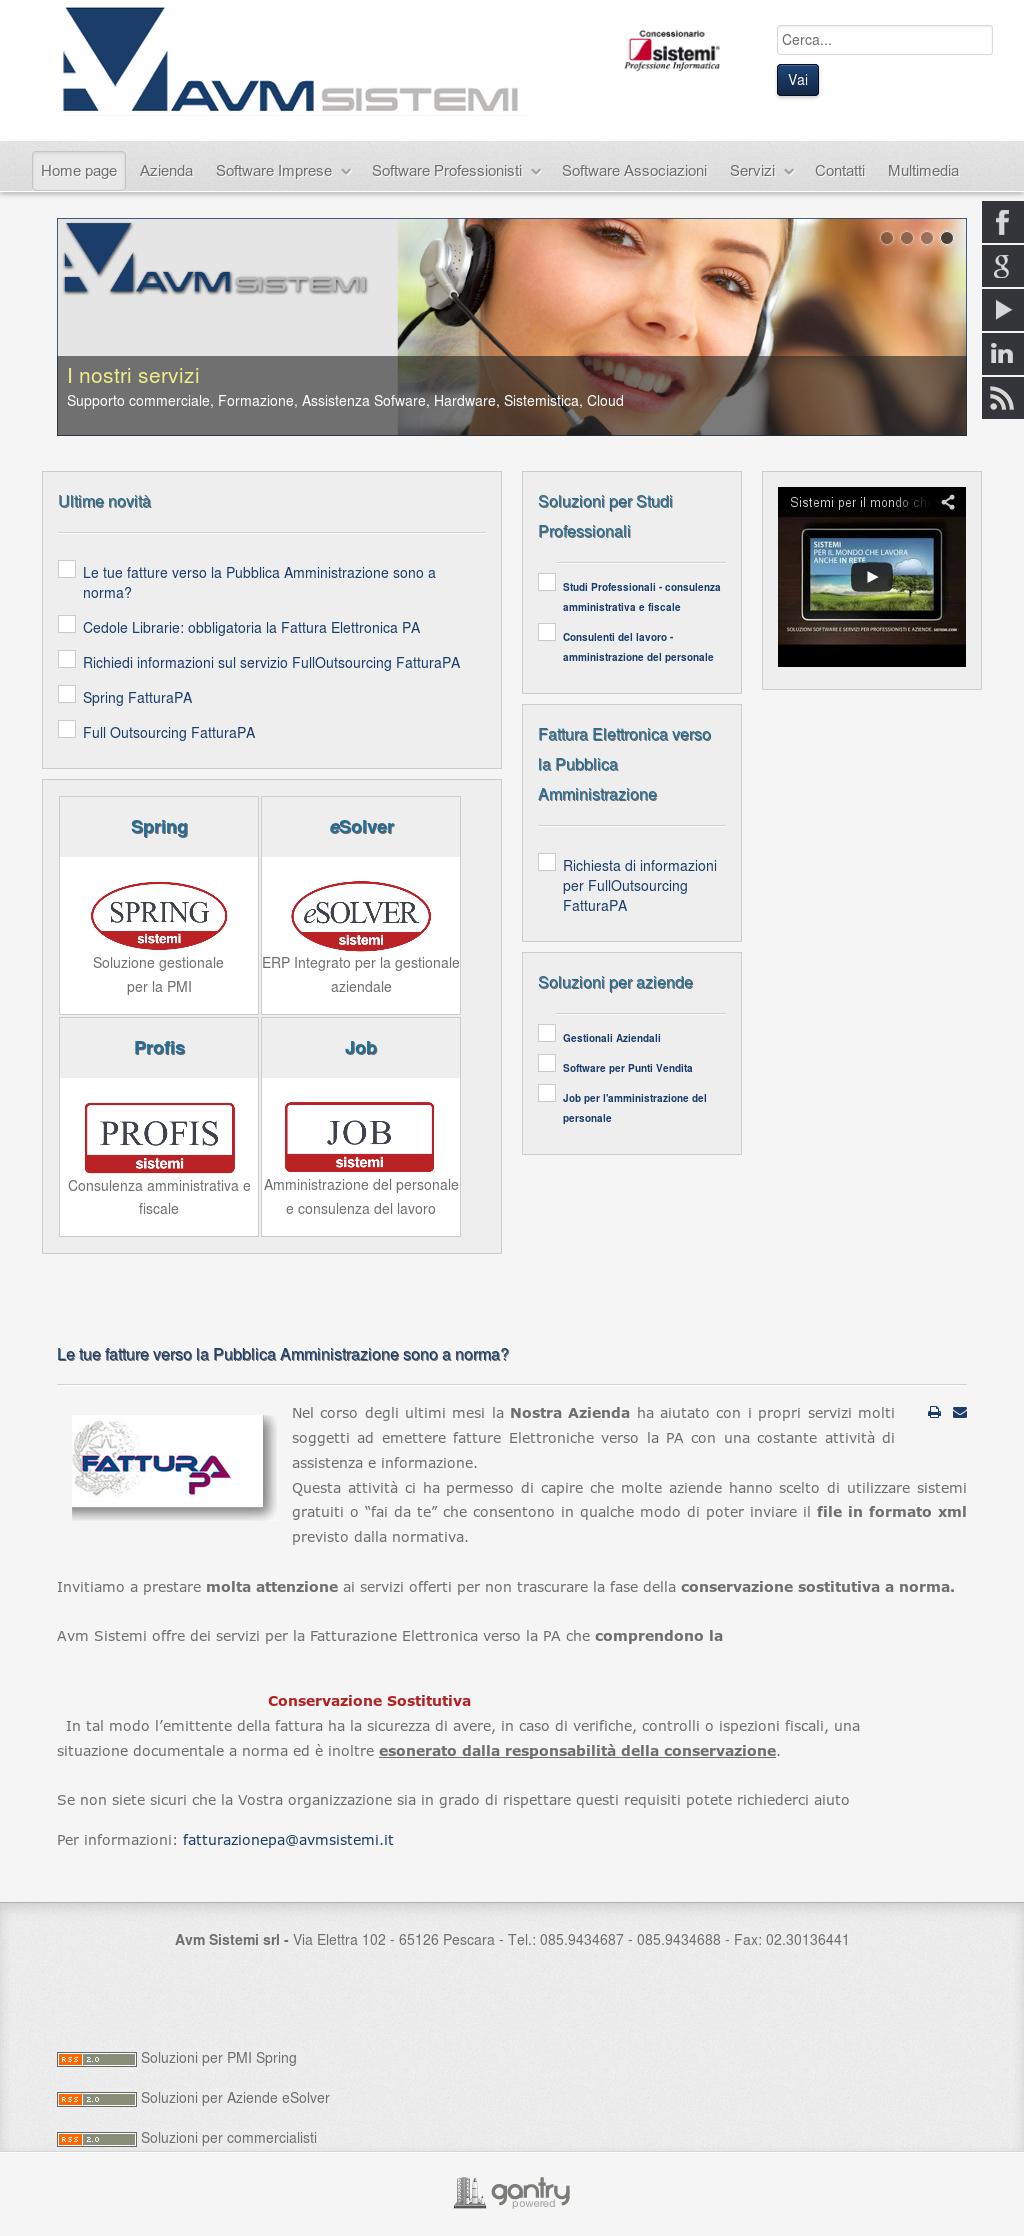 Avm Sistemi Competitors, Revenue and Employees - Owler Company Profile